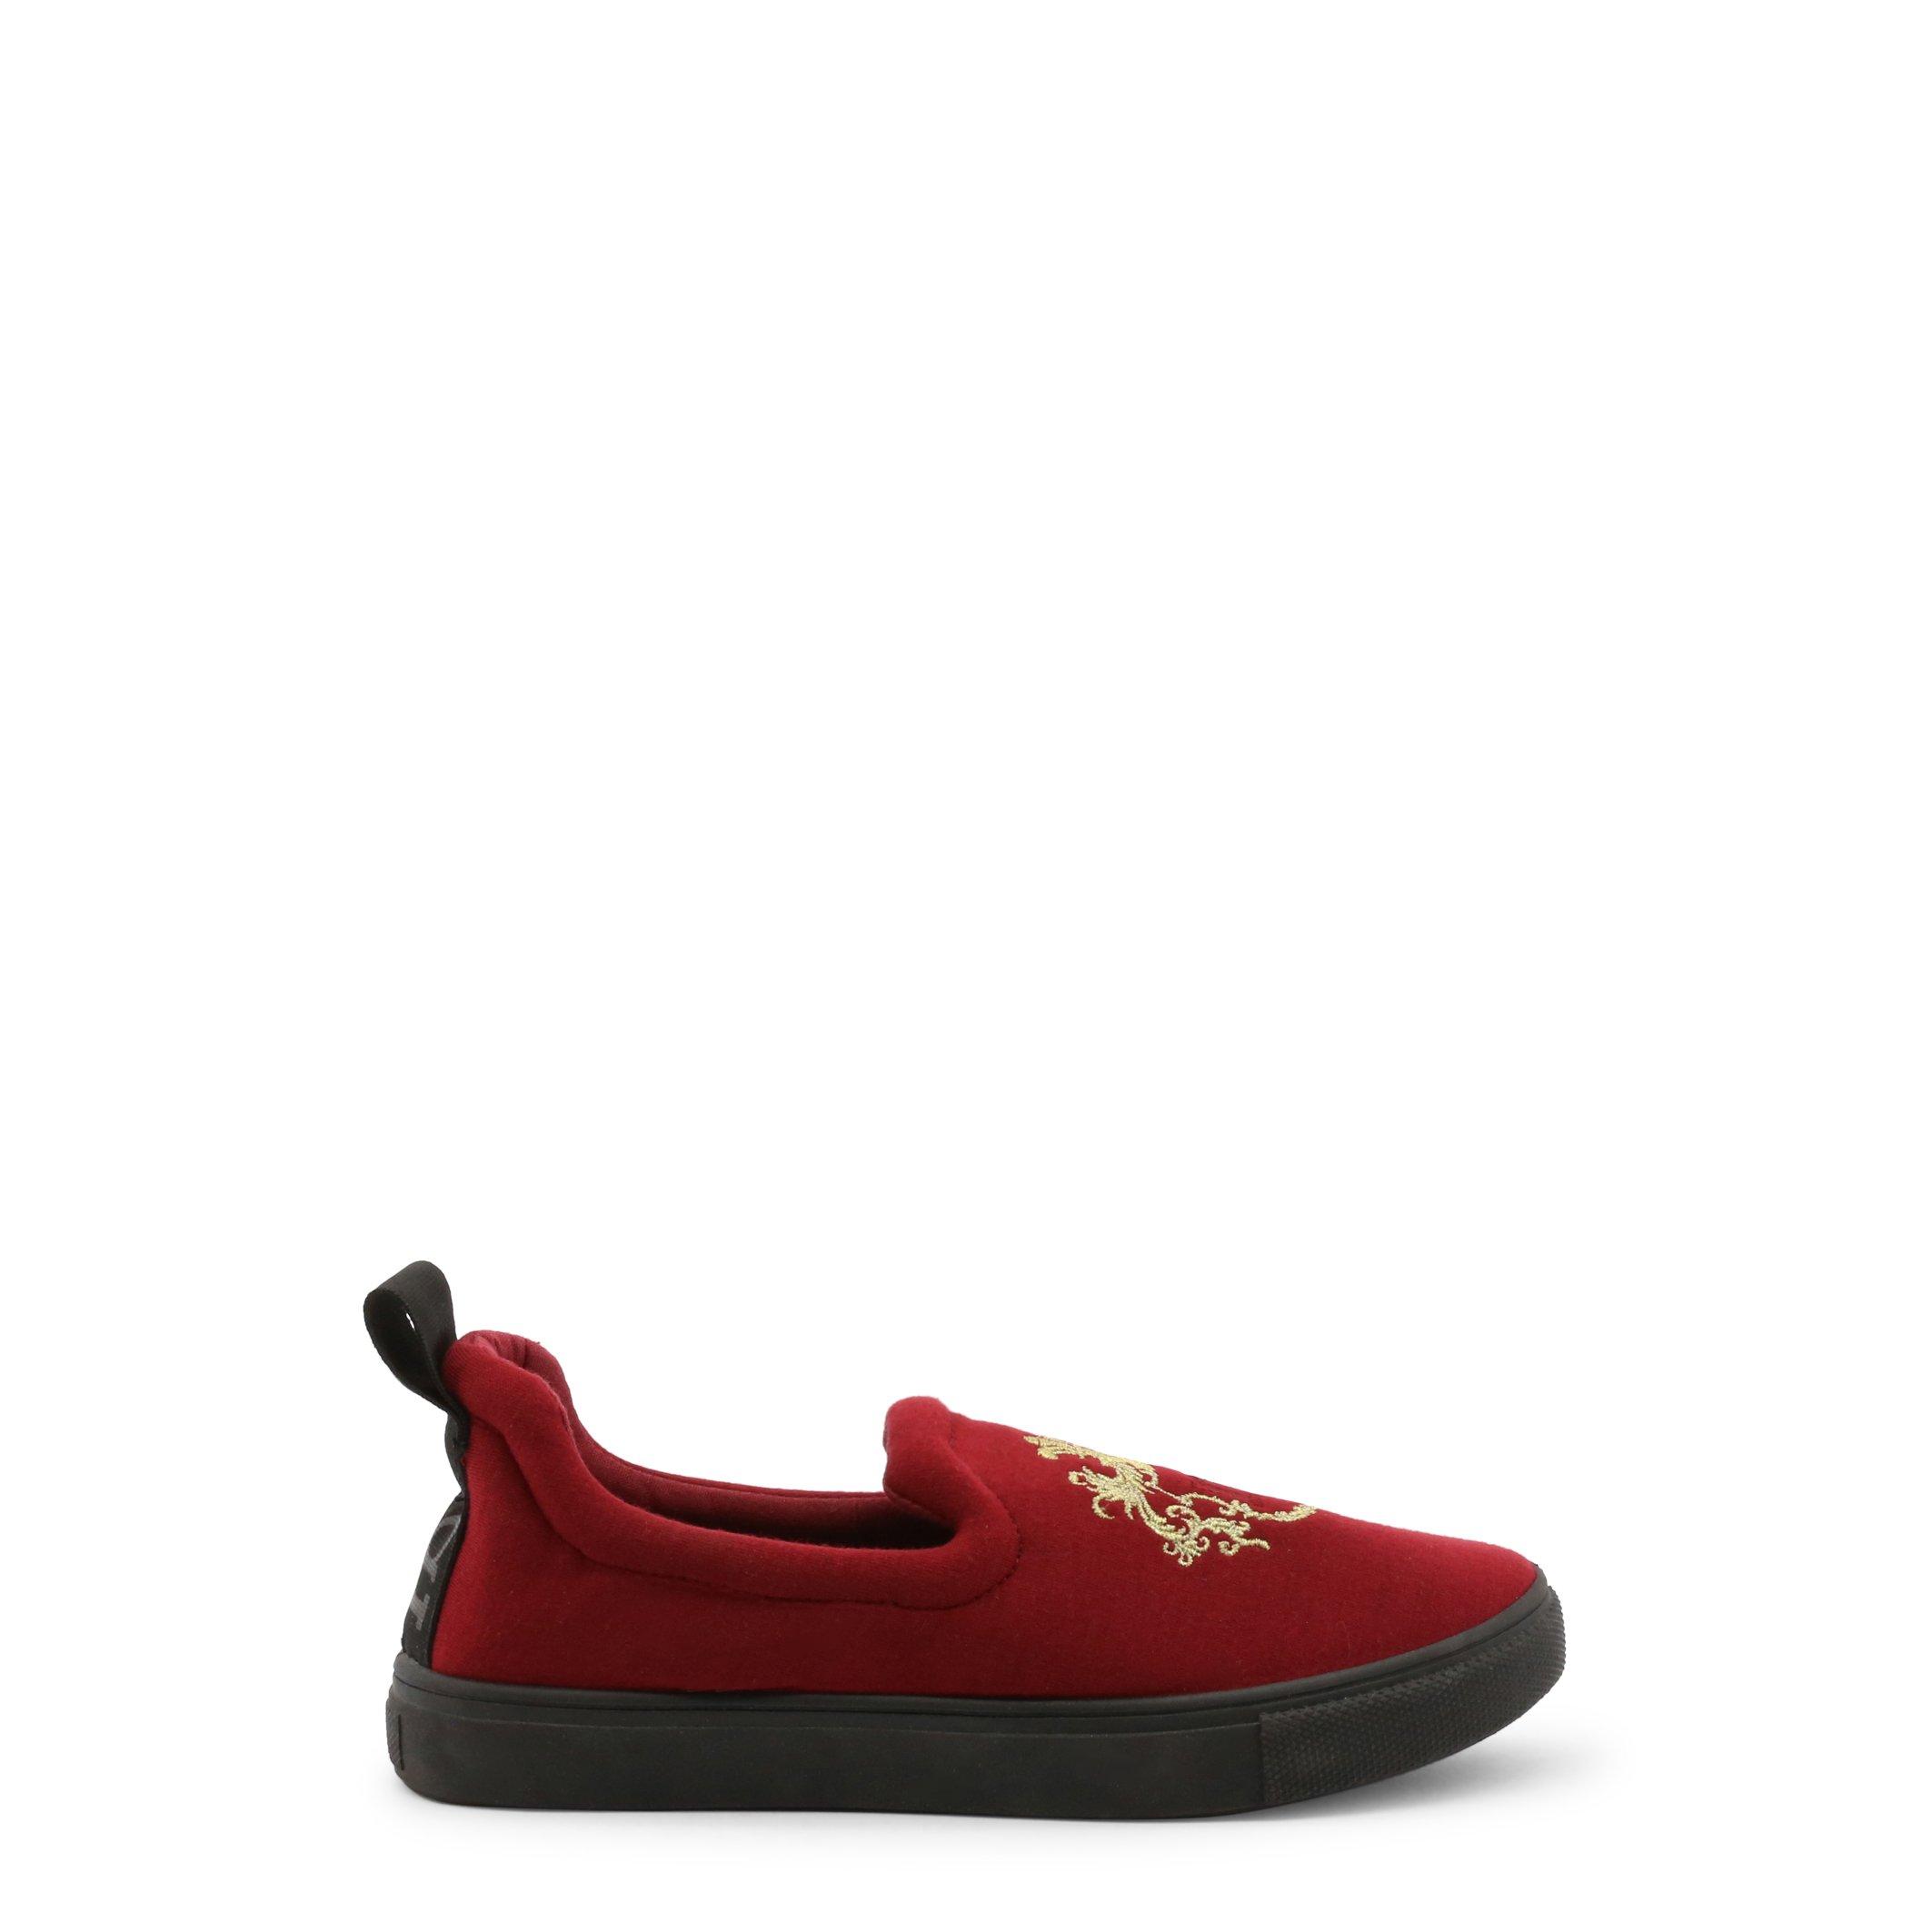 Roccobarocco Women's Slip On Shoes Black 336976 - red EU 37